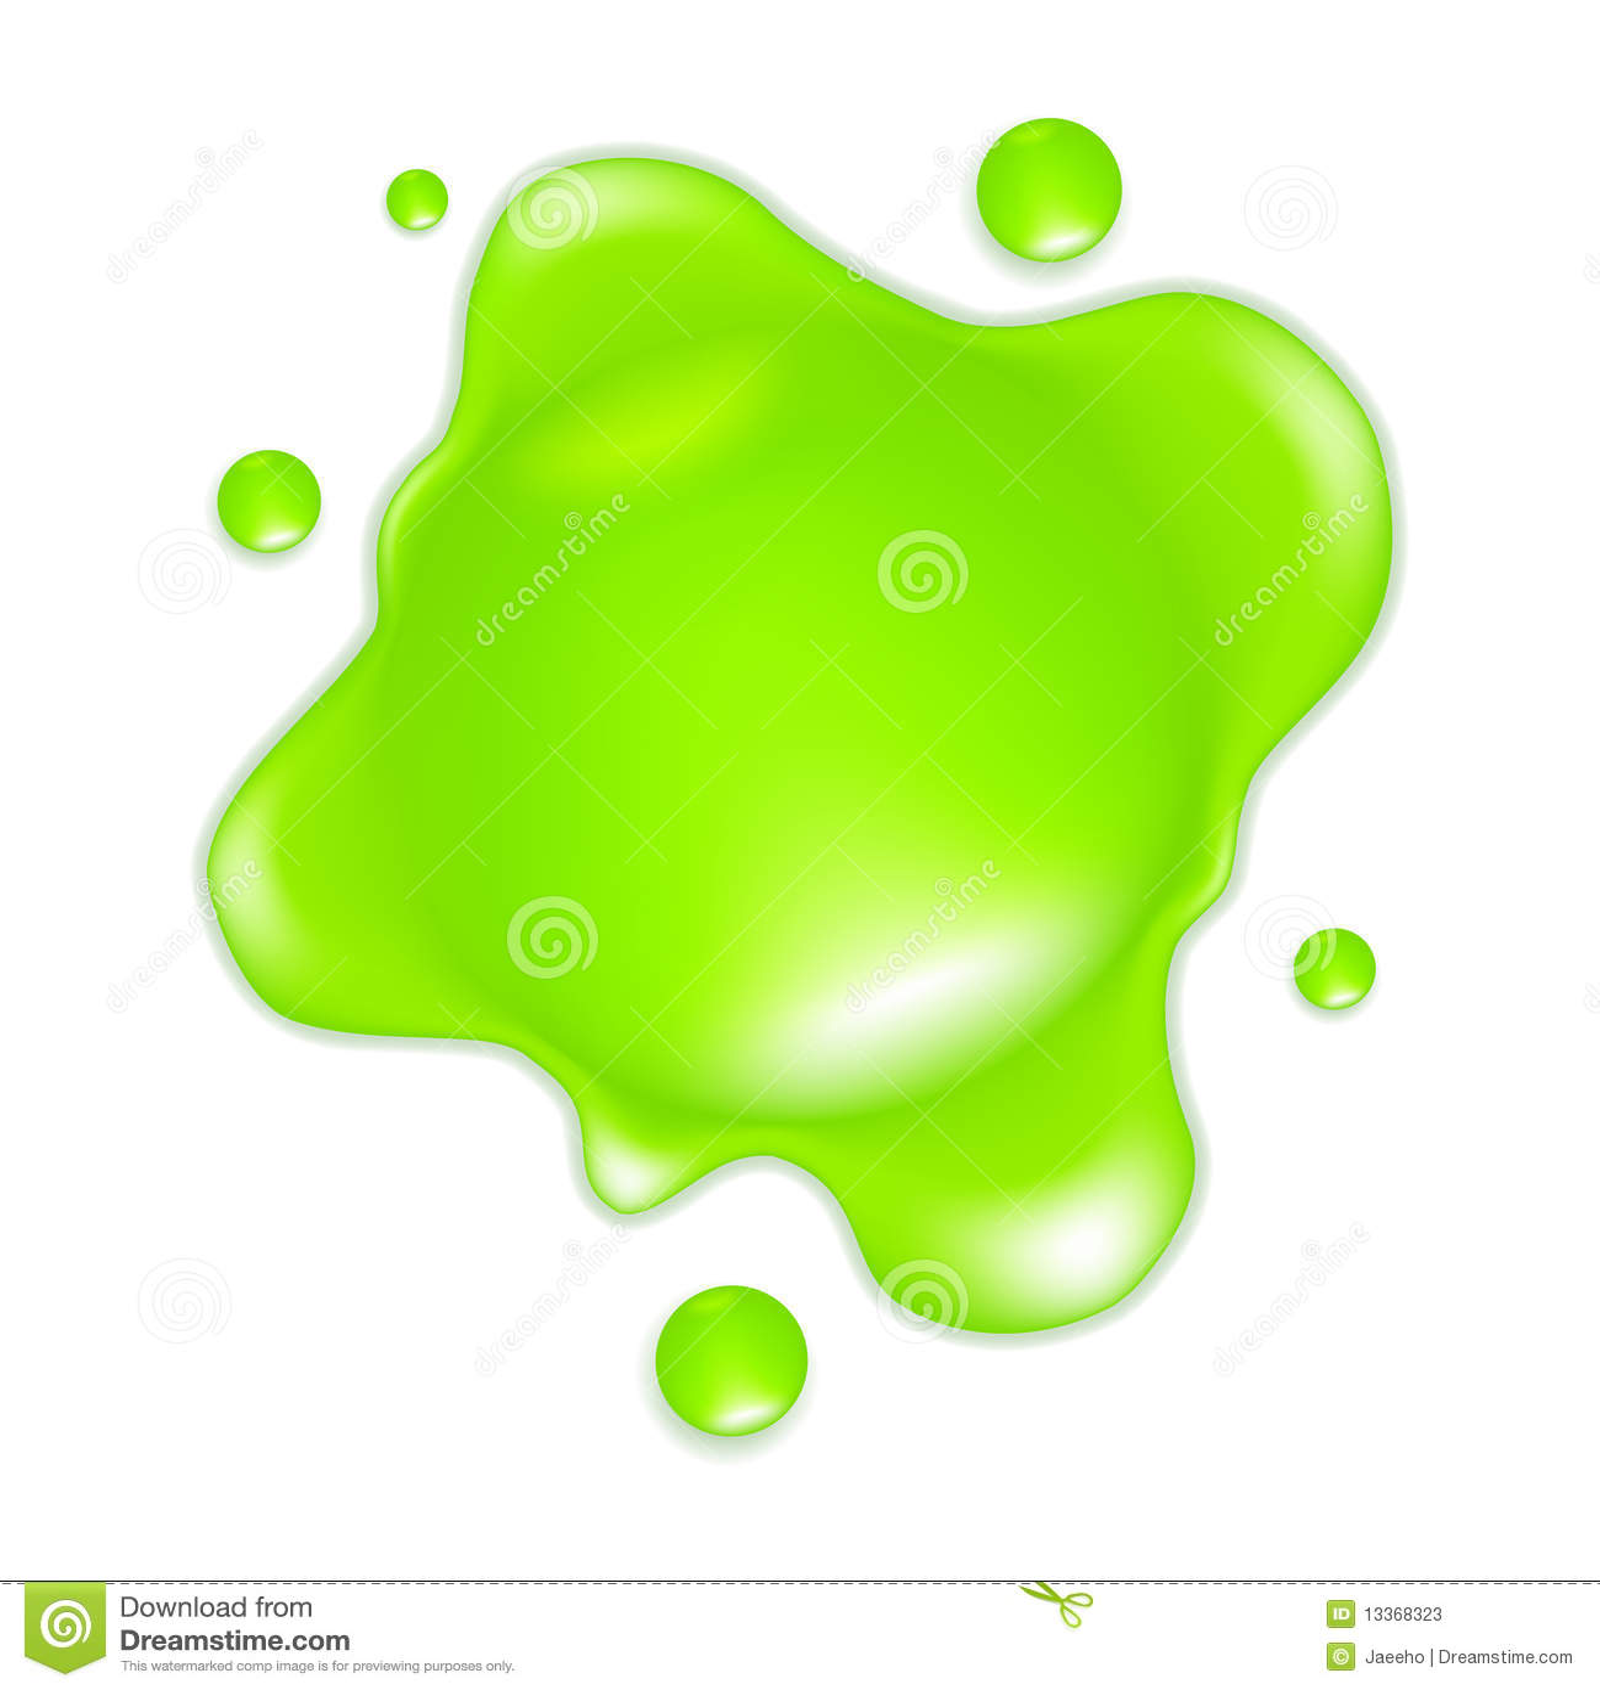 Green Slime Stock Photos - Image: 13368323